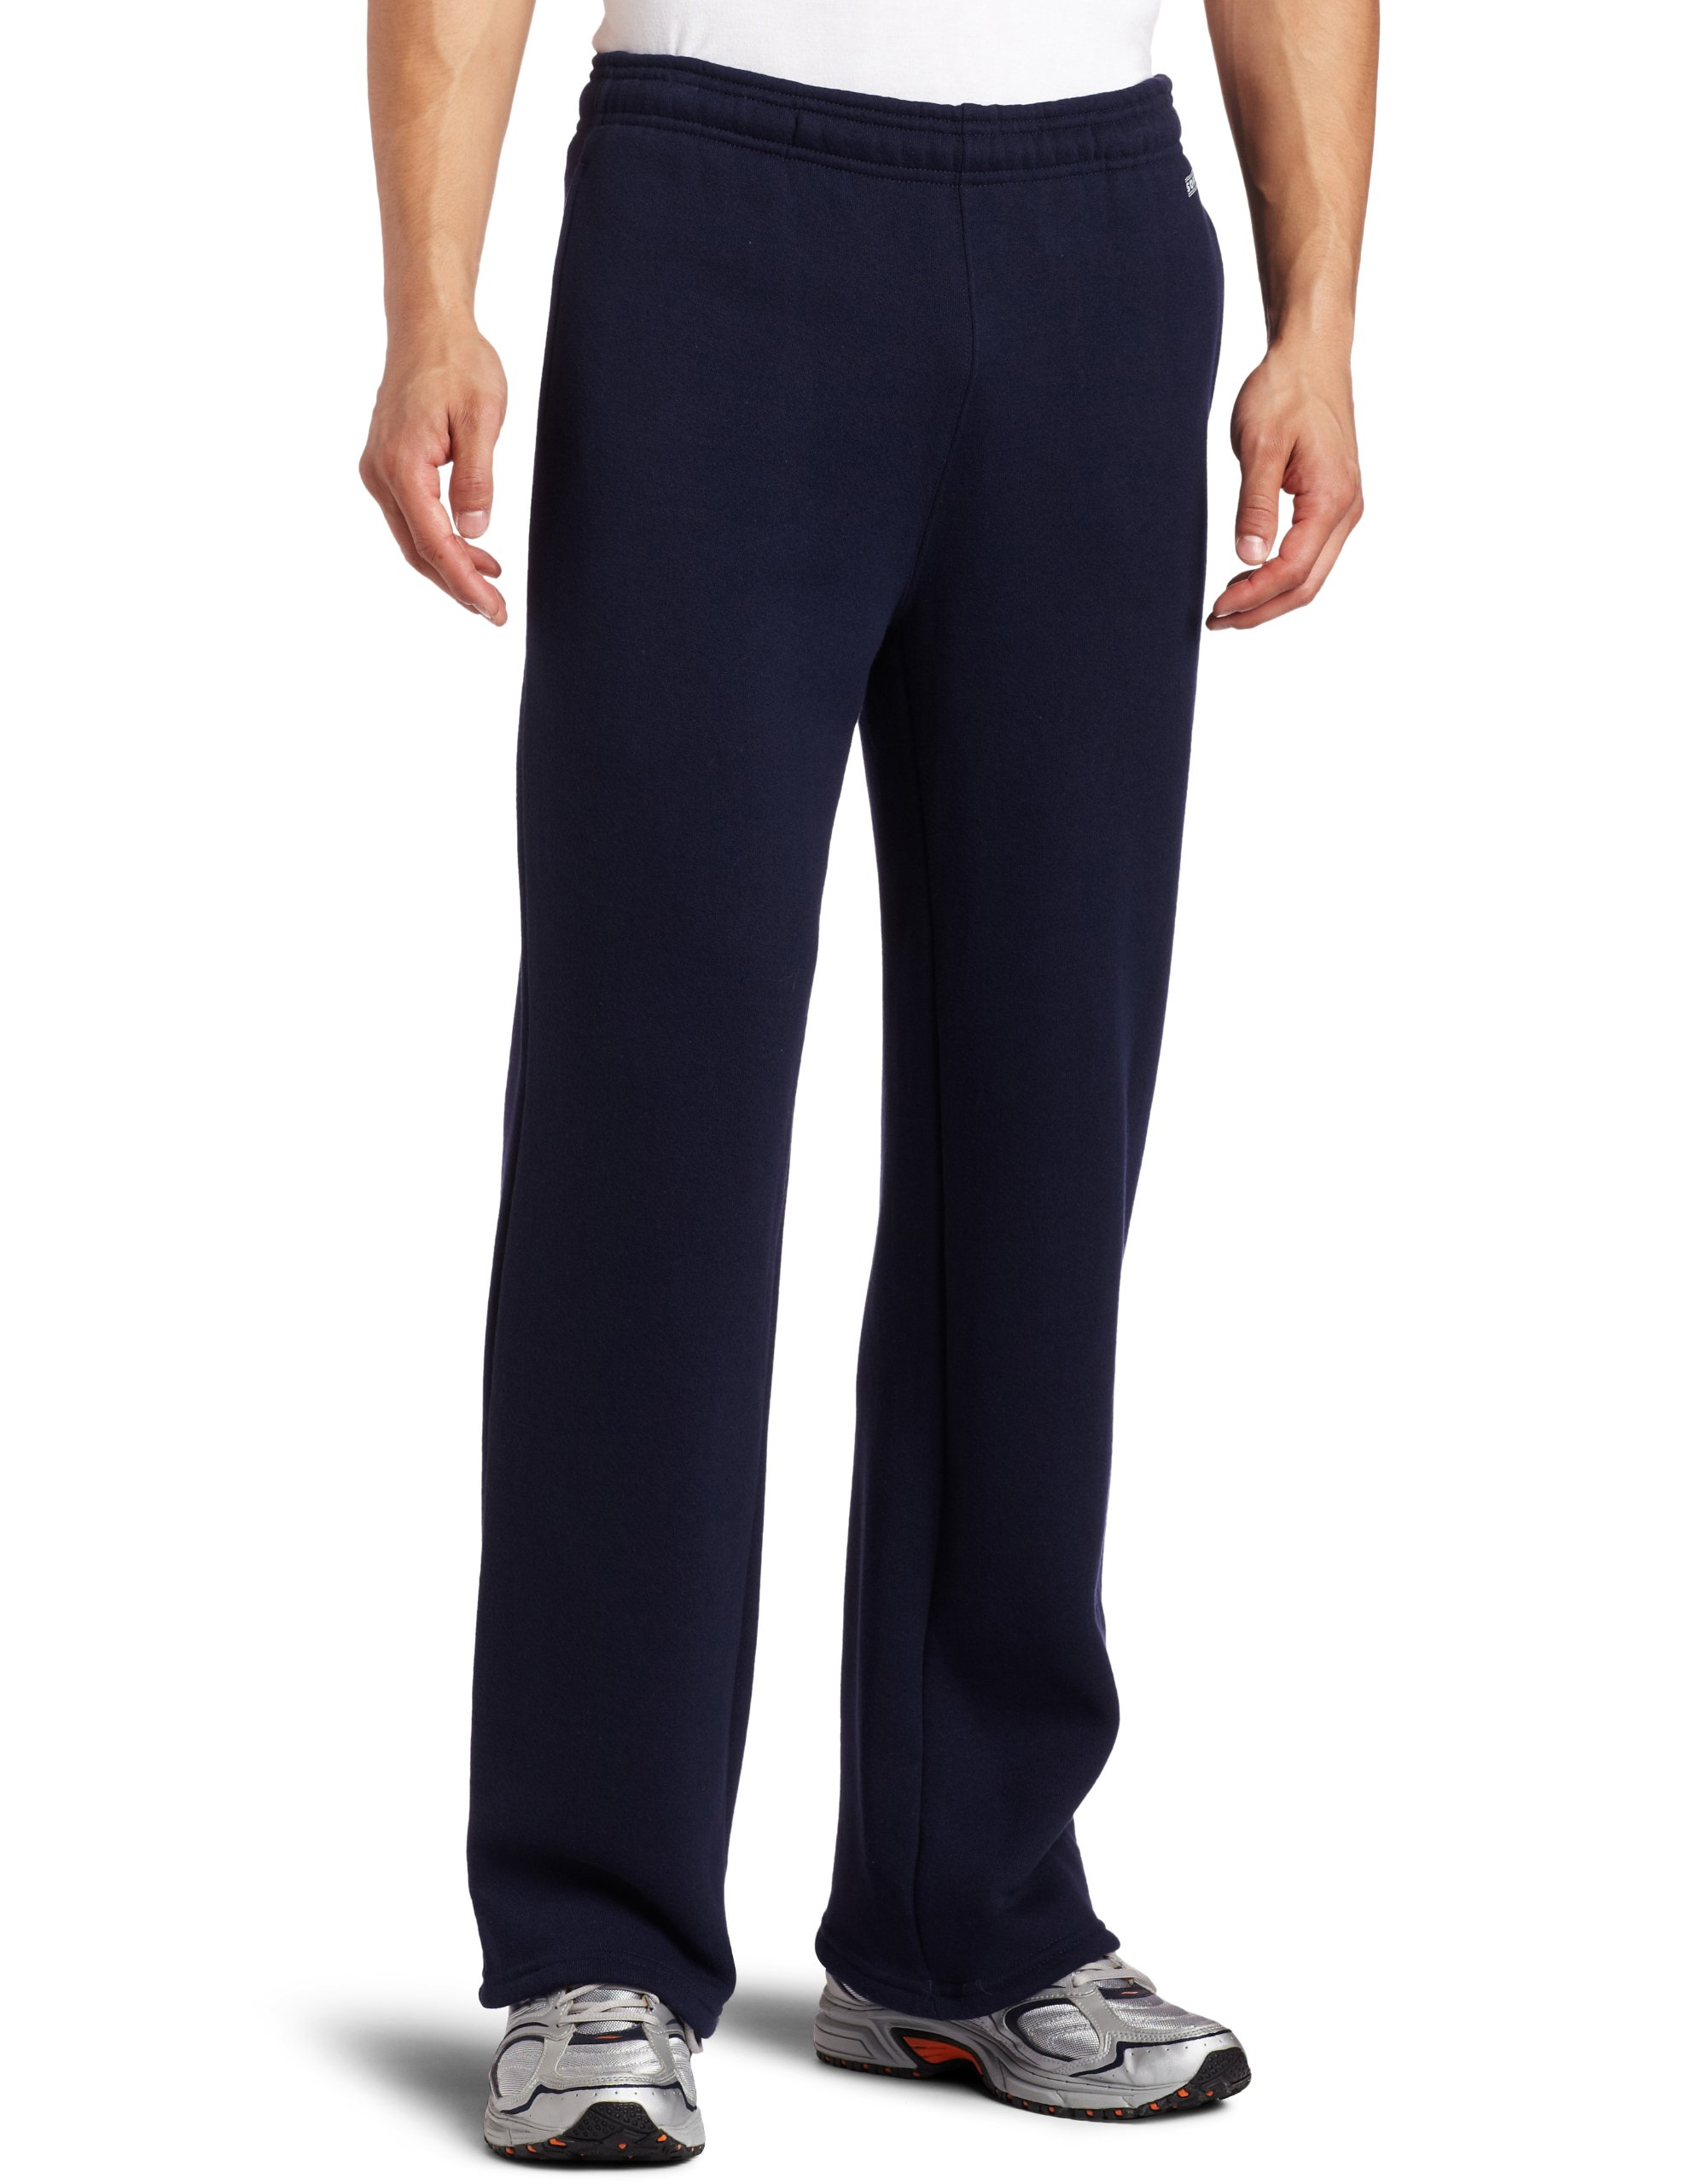 Soffe Men's Training Fleece Pocket Pant Navy Small